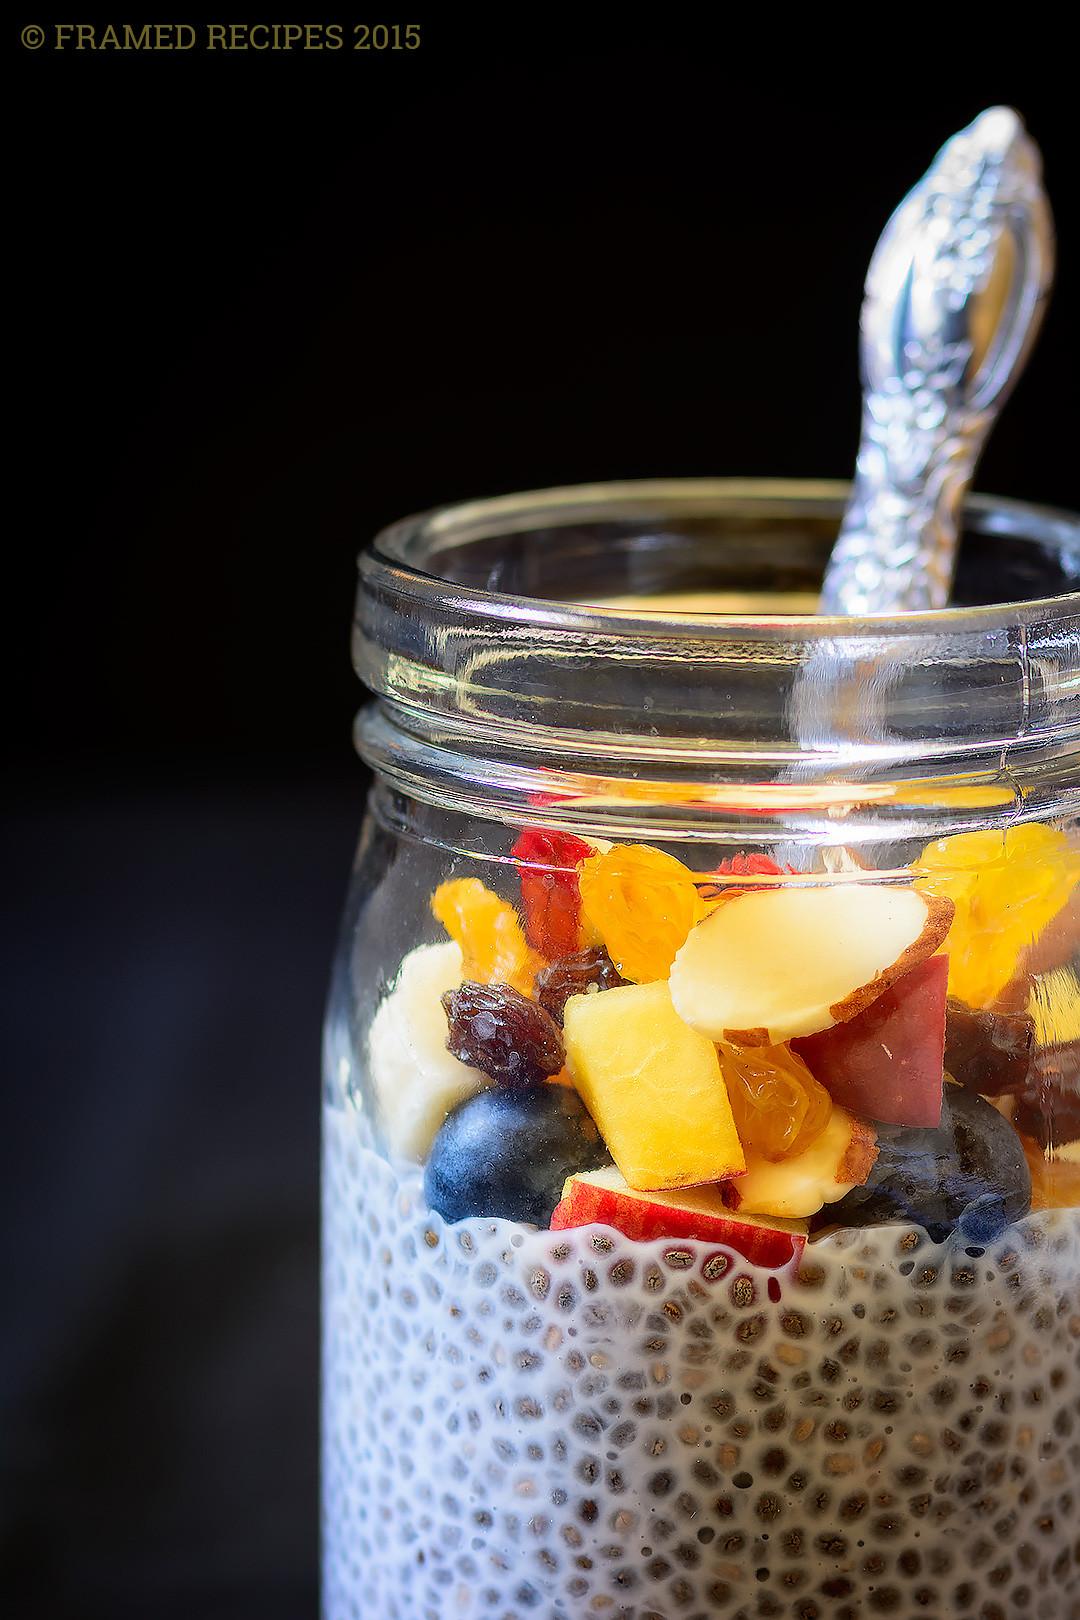 Chia Seed Breakfast Recipe  Chia Seeds Breakfast Bowl Framed Recipes